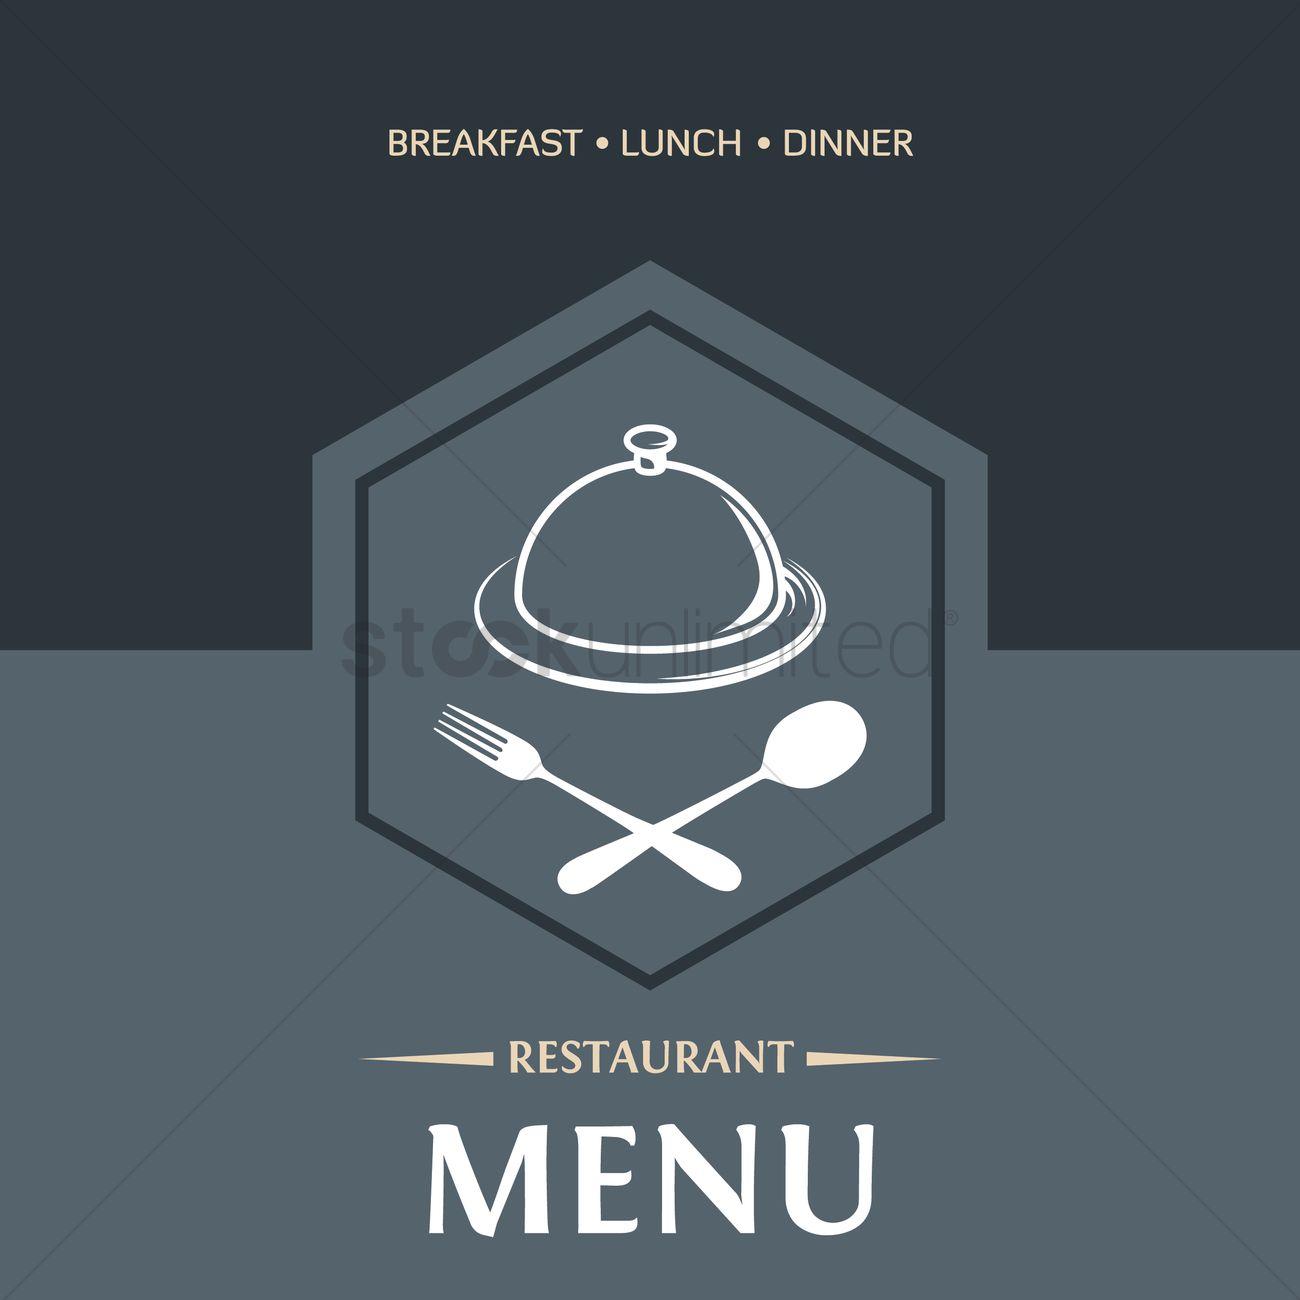 Restaurant Menu Design Vector Image 1859485 Stockunlimited